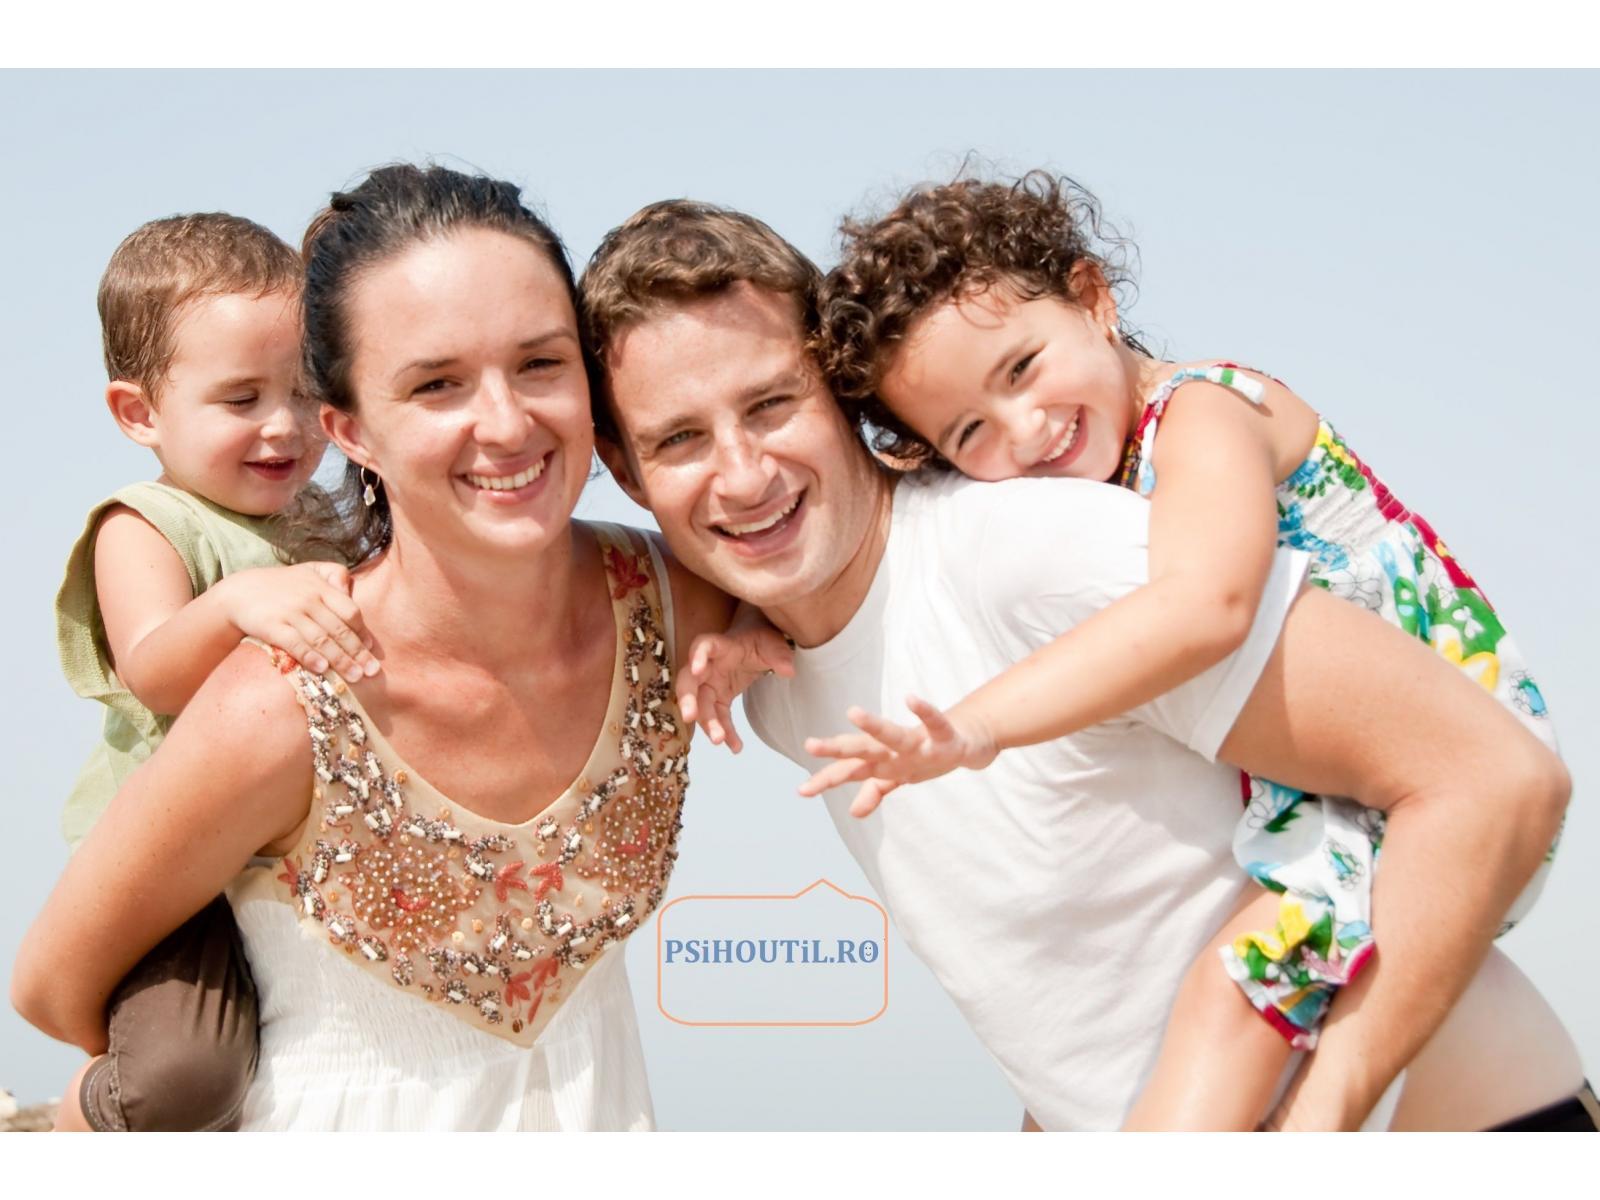 PSIHOTERAPIE & DEZVOLTARE PERSONALA - cuplu,_familie,_copii.__PSIHOUTIL.RO.jpg